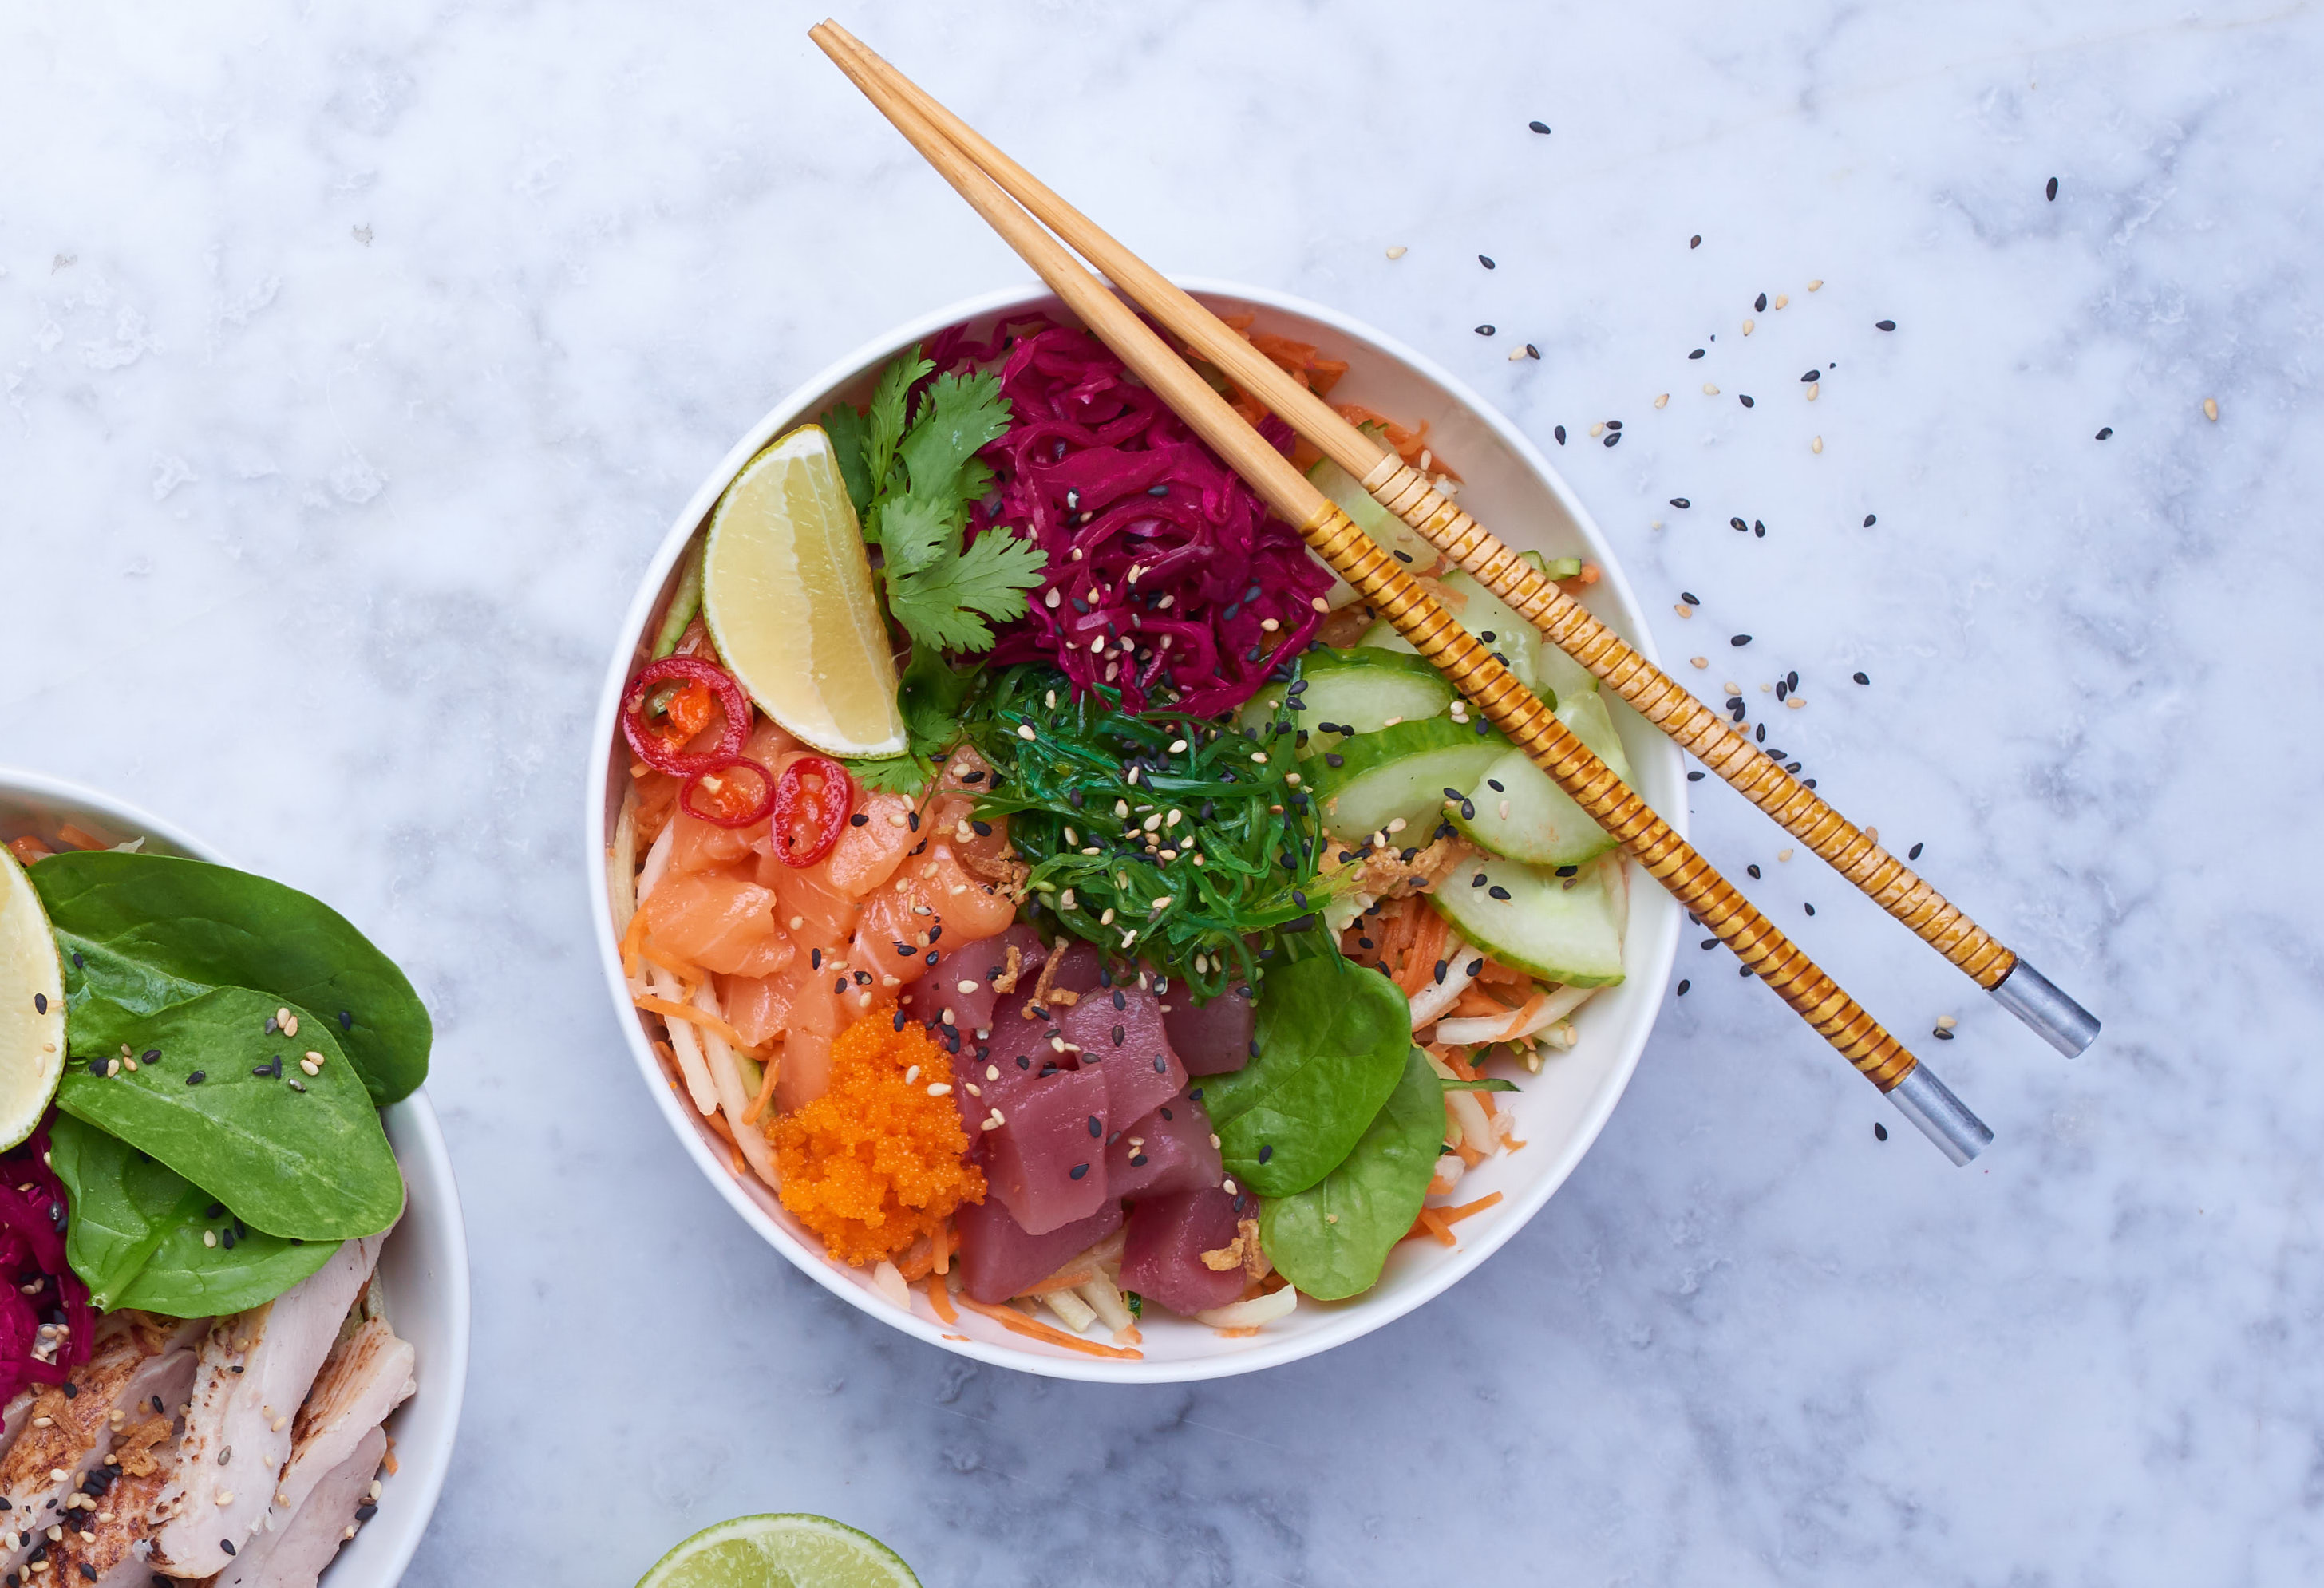 Salmon, tuna, carrot, cucumber, coriander, mint - very nutritious poké bowl